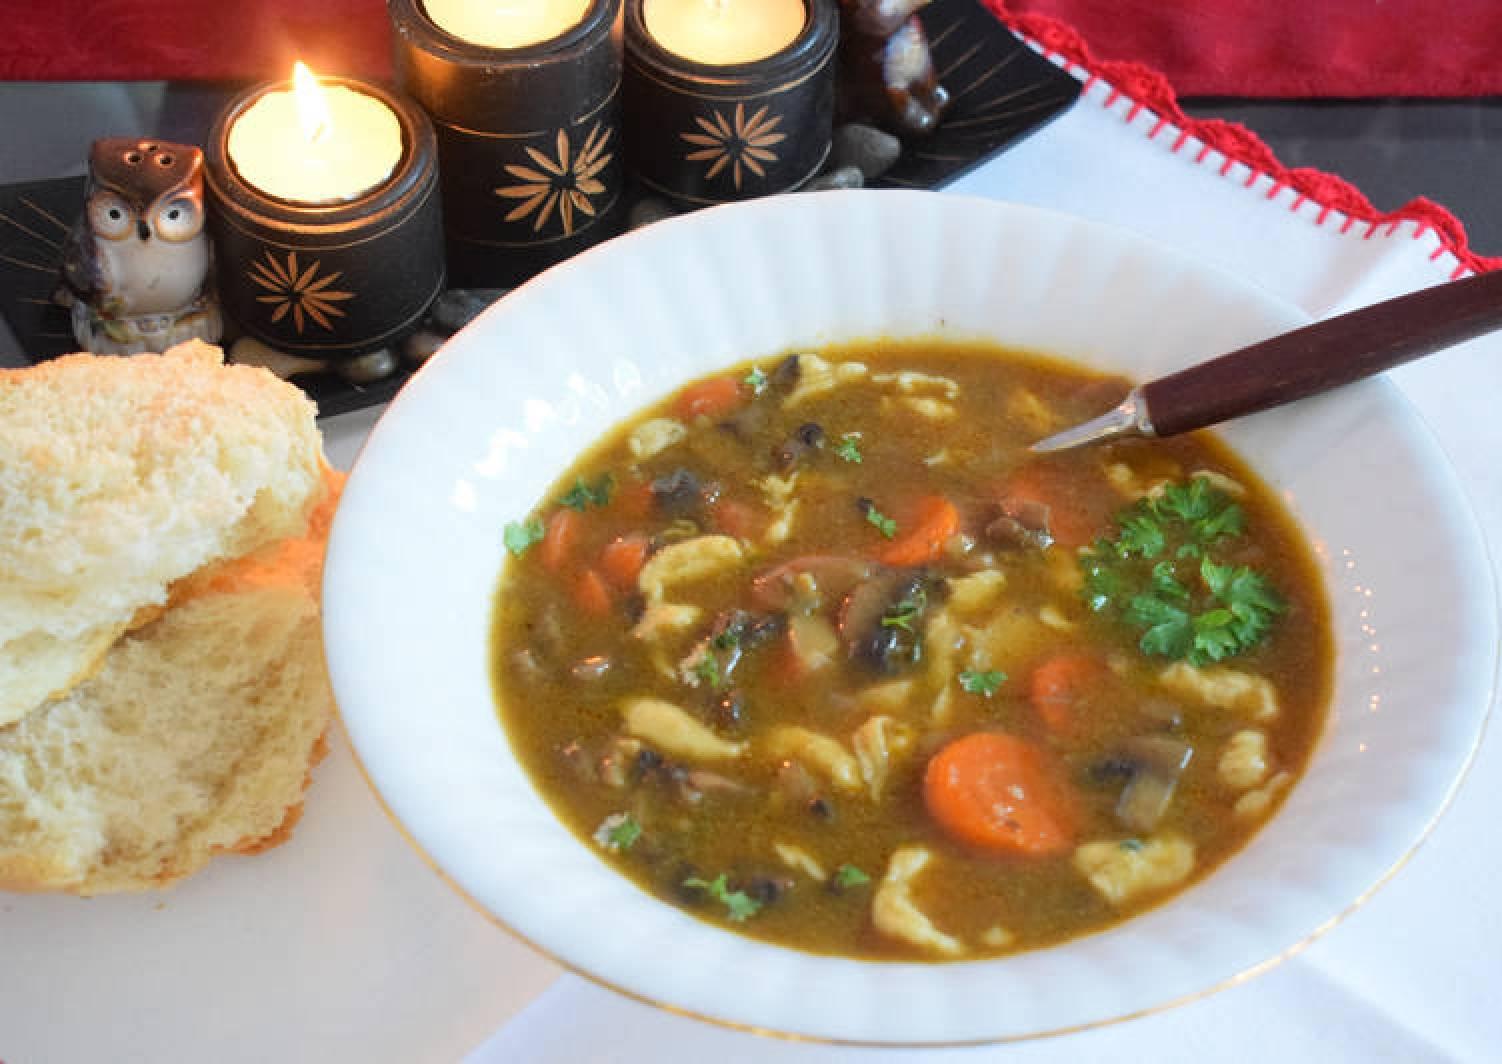 Eva's spicy mushroom soup